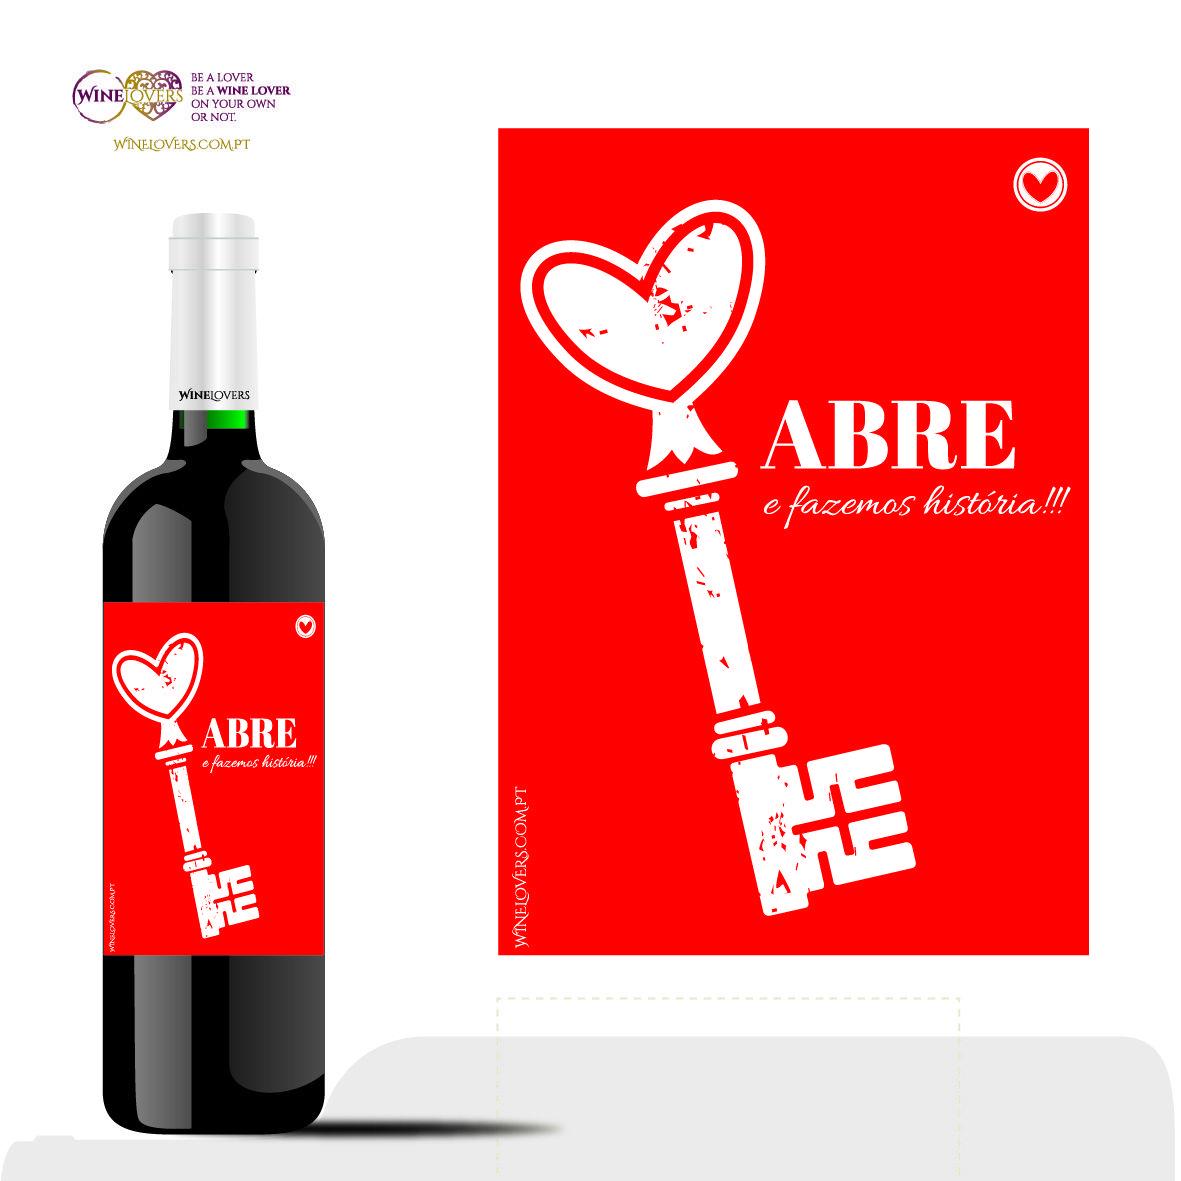 Winegift Label Ref Lo6 Facebook Com Winelovers Com Pt Como Ser Criativo Seres Produtores Wine